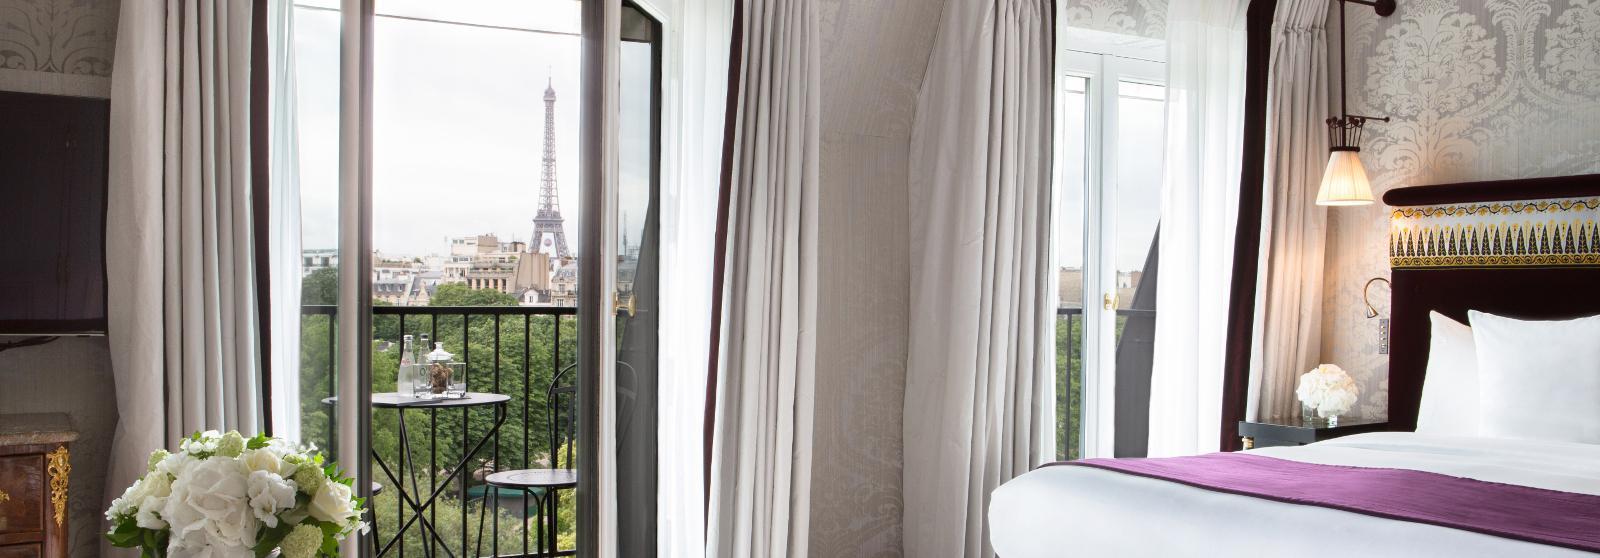 巴黎瑞瑟夫酒店(La Reserve Paris Hotel and Spa)【 巴黎,法国】 酒店  www.lhw.cn